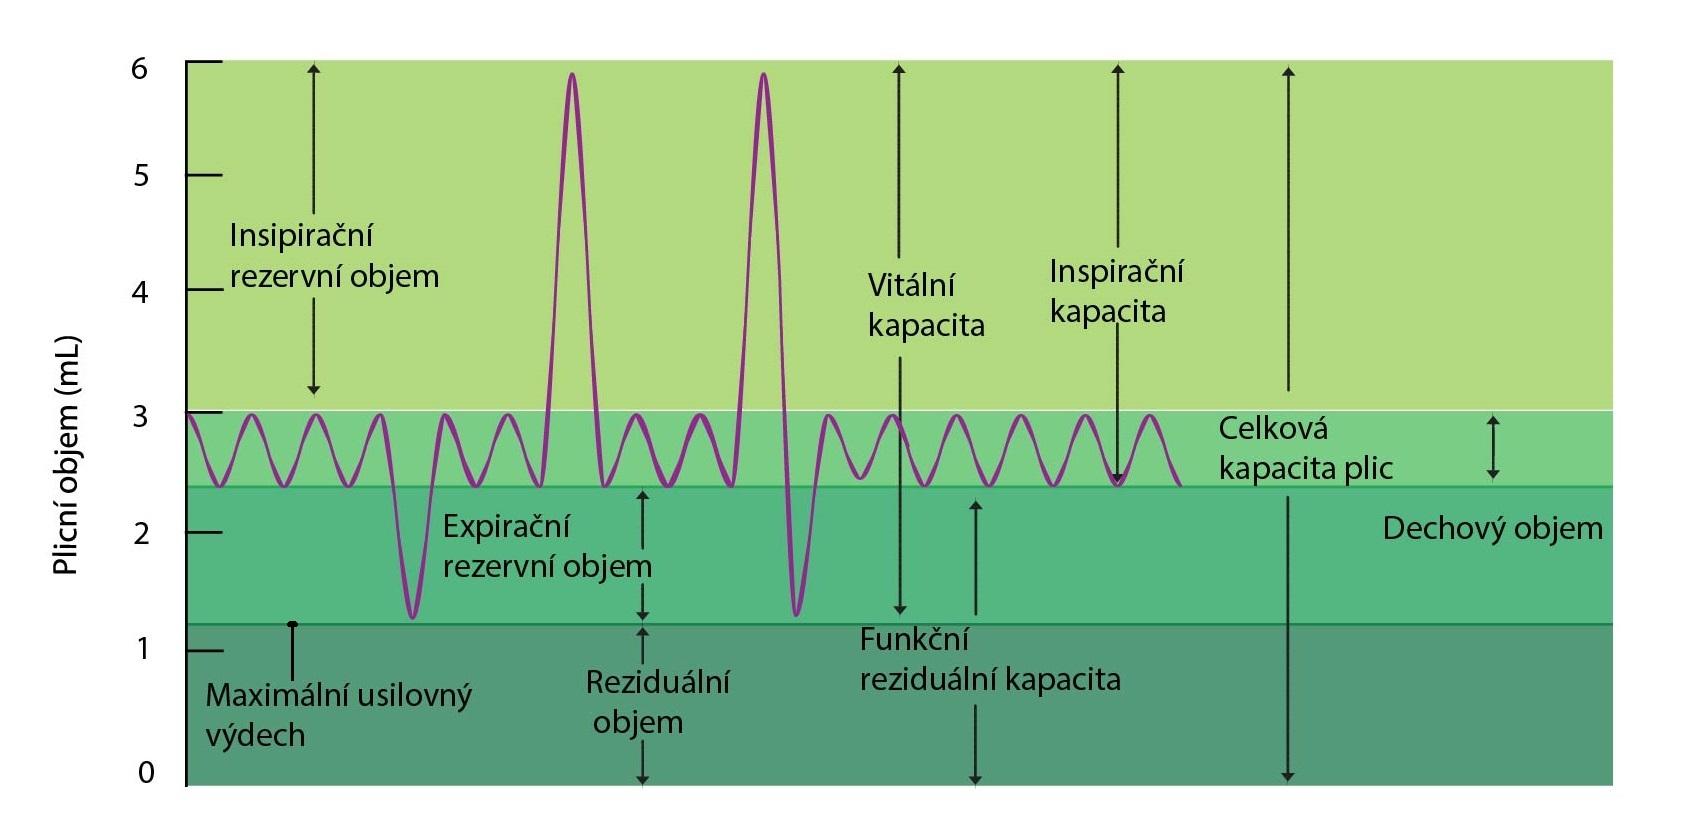 objemy a kapacity plic-01